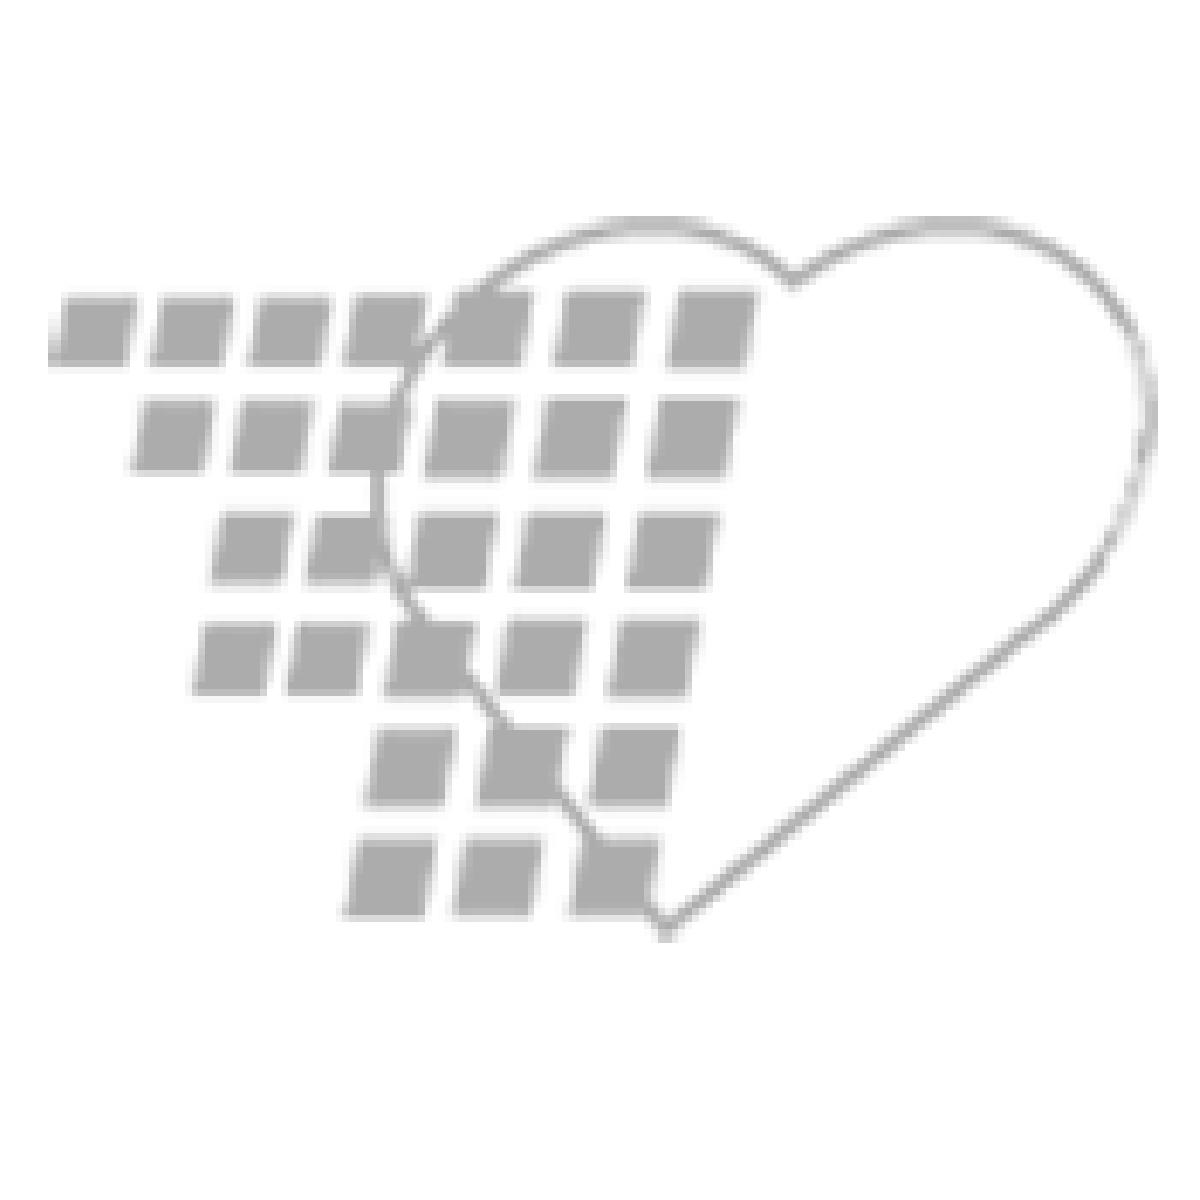 06-93-1134 Demo Dose® Calcim Chlorid 10% 10mL